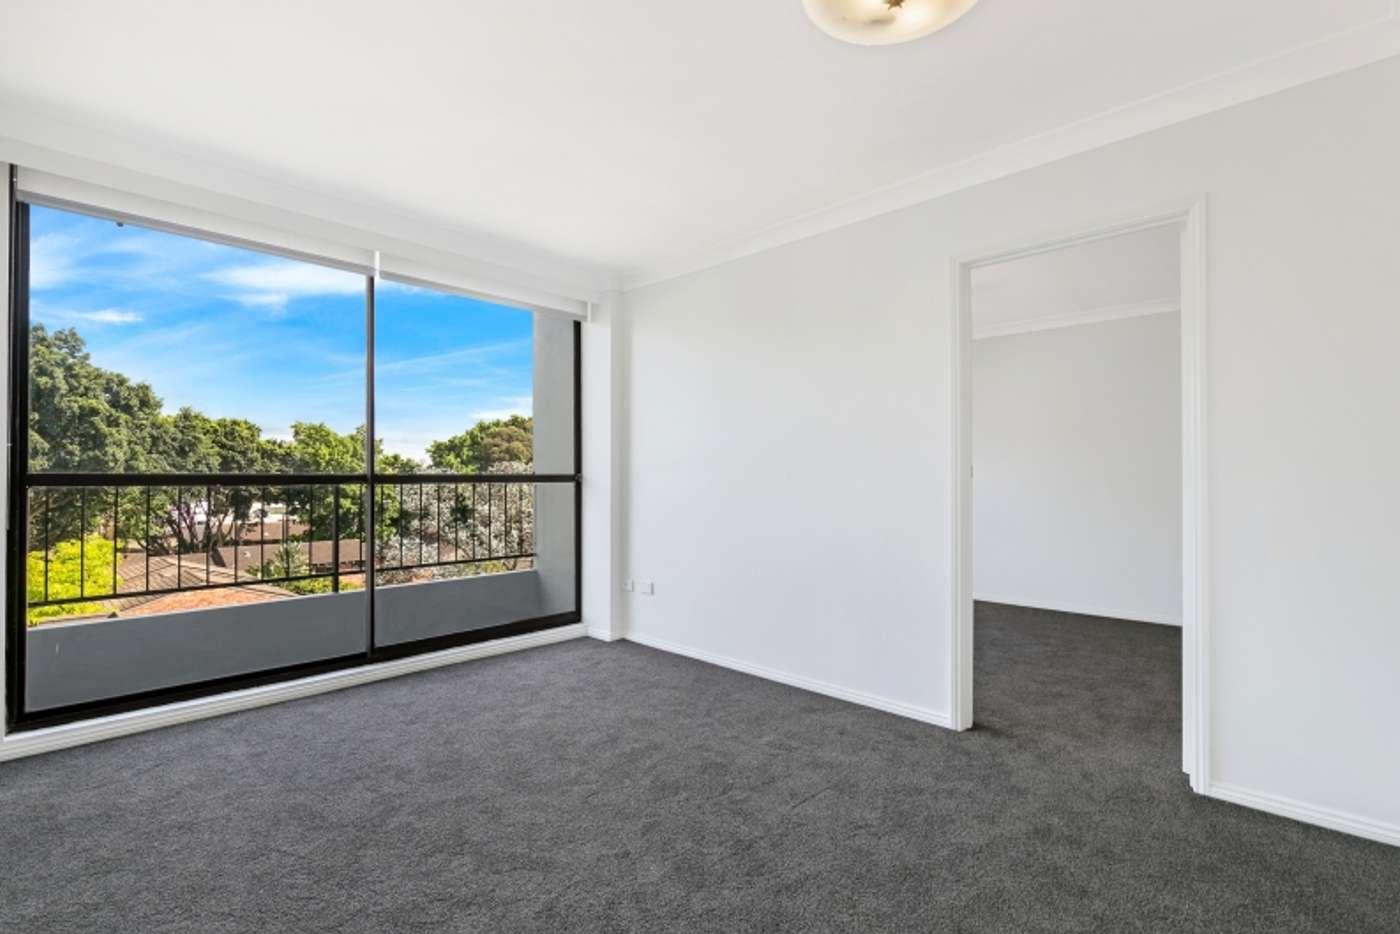 Main view of Homely apartment listing, 5F/4 Hampden Street, Paddington NSW 2021